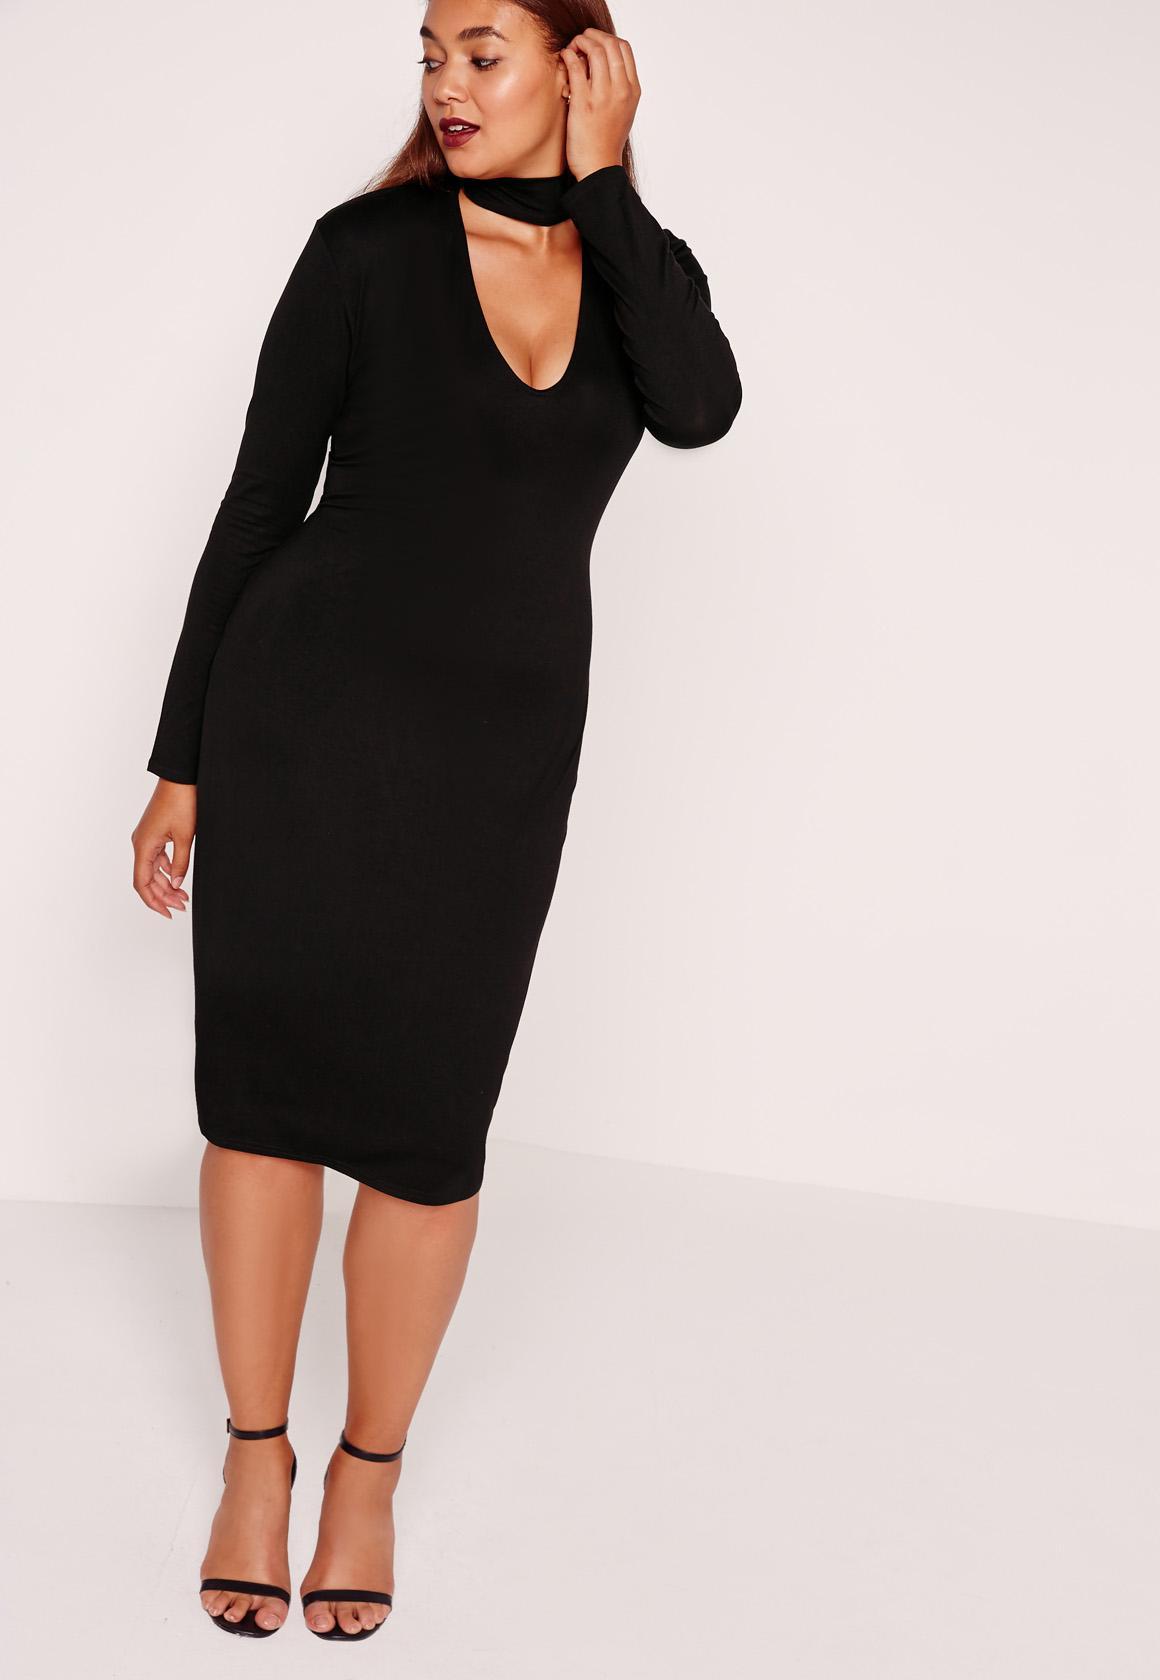 Plus Size Choker Neck Longline Bodycon Dress Black | Missguided